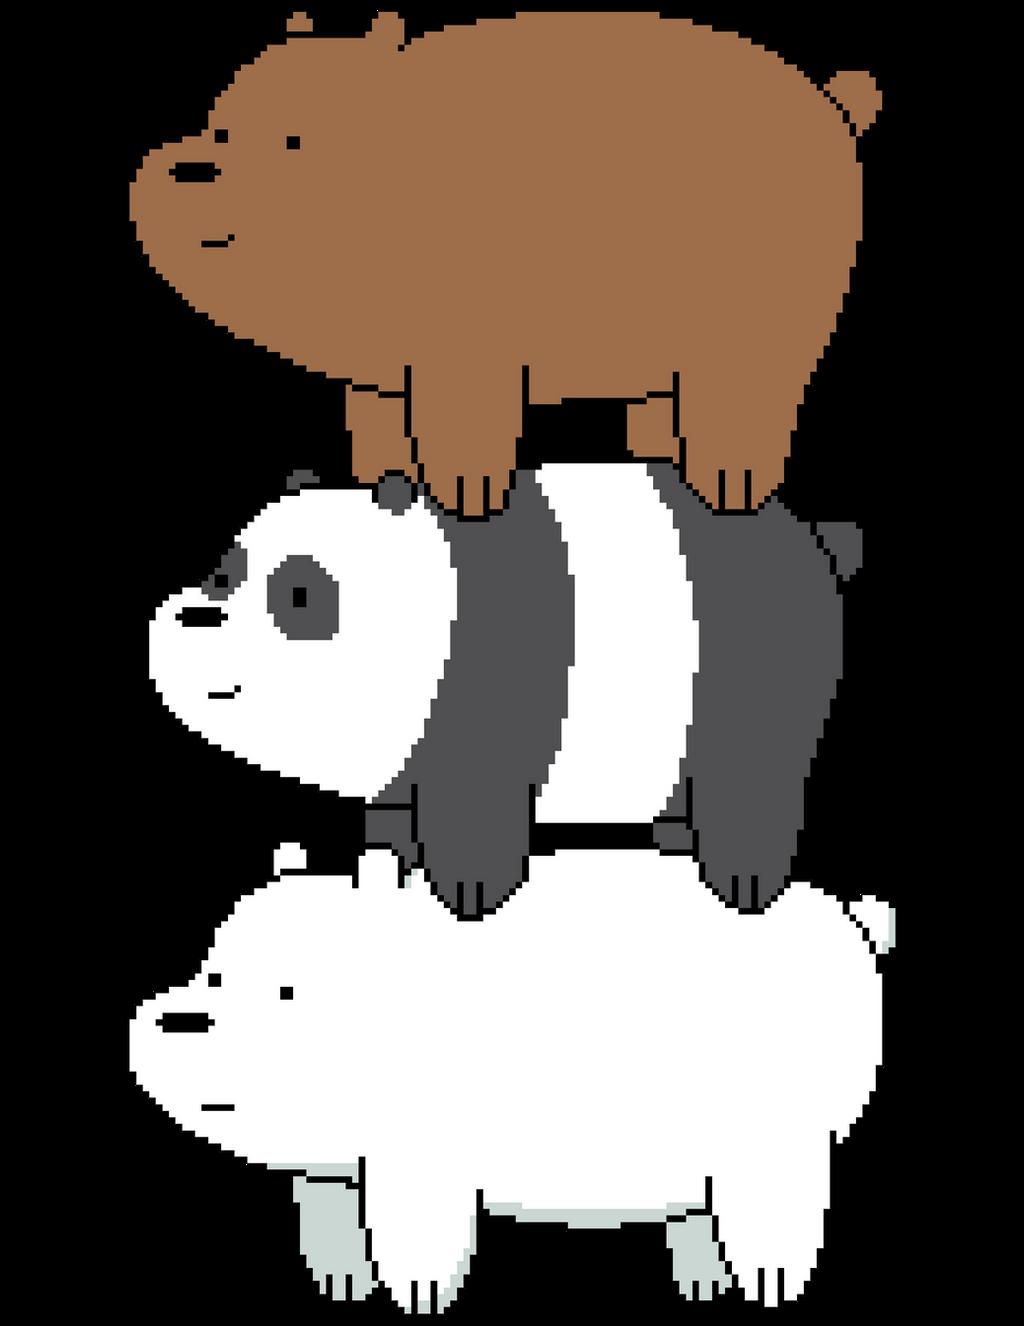 We Bare Bears Pixel Art By Nezz94 On Deviantart